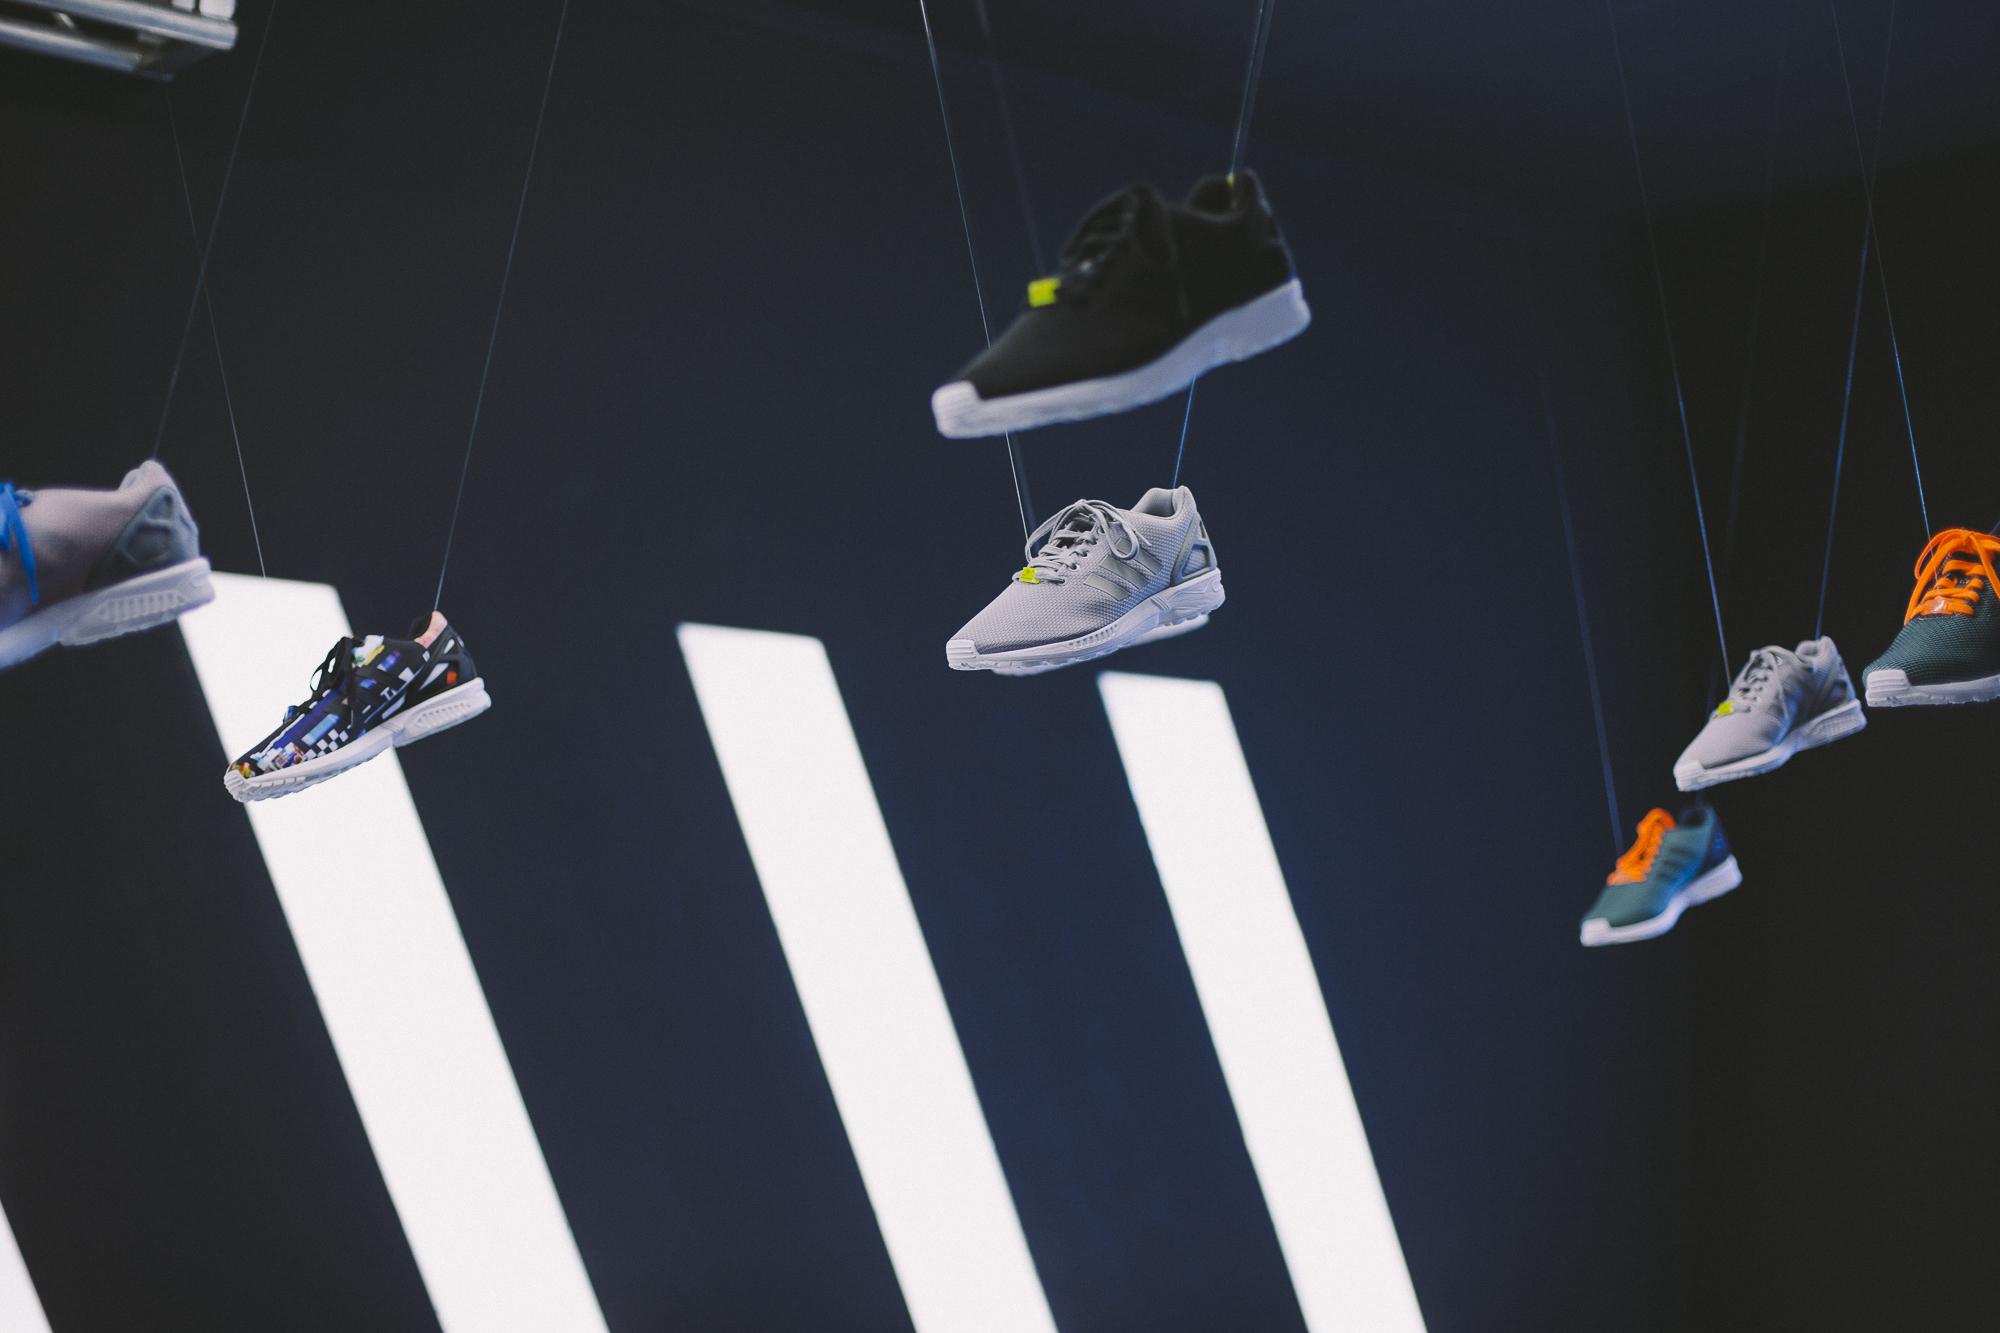 17_Adidas_ZX Flux_KimTerriSmith.jpg